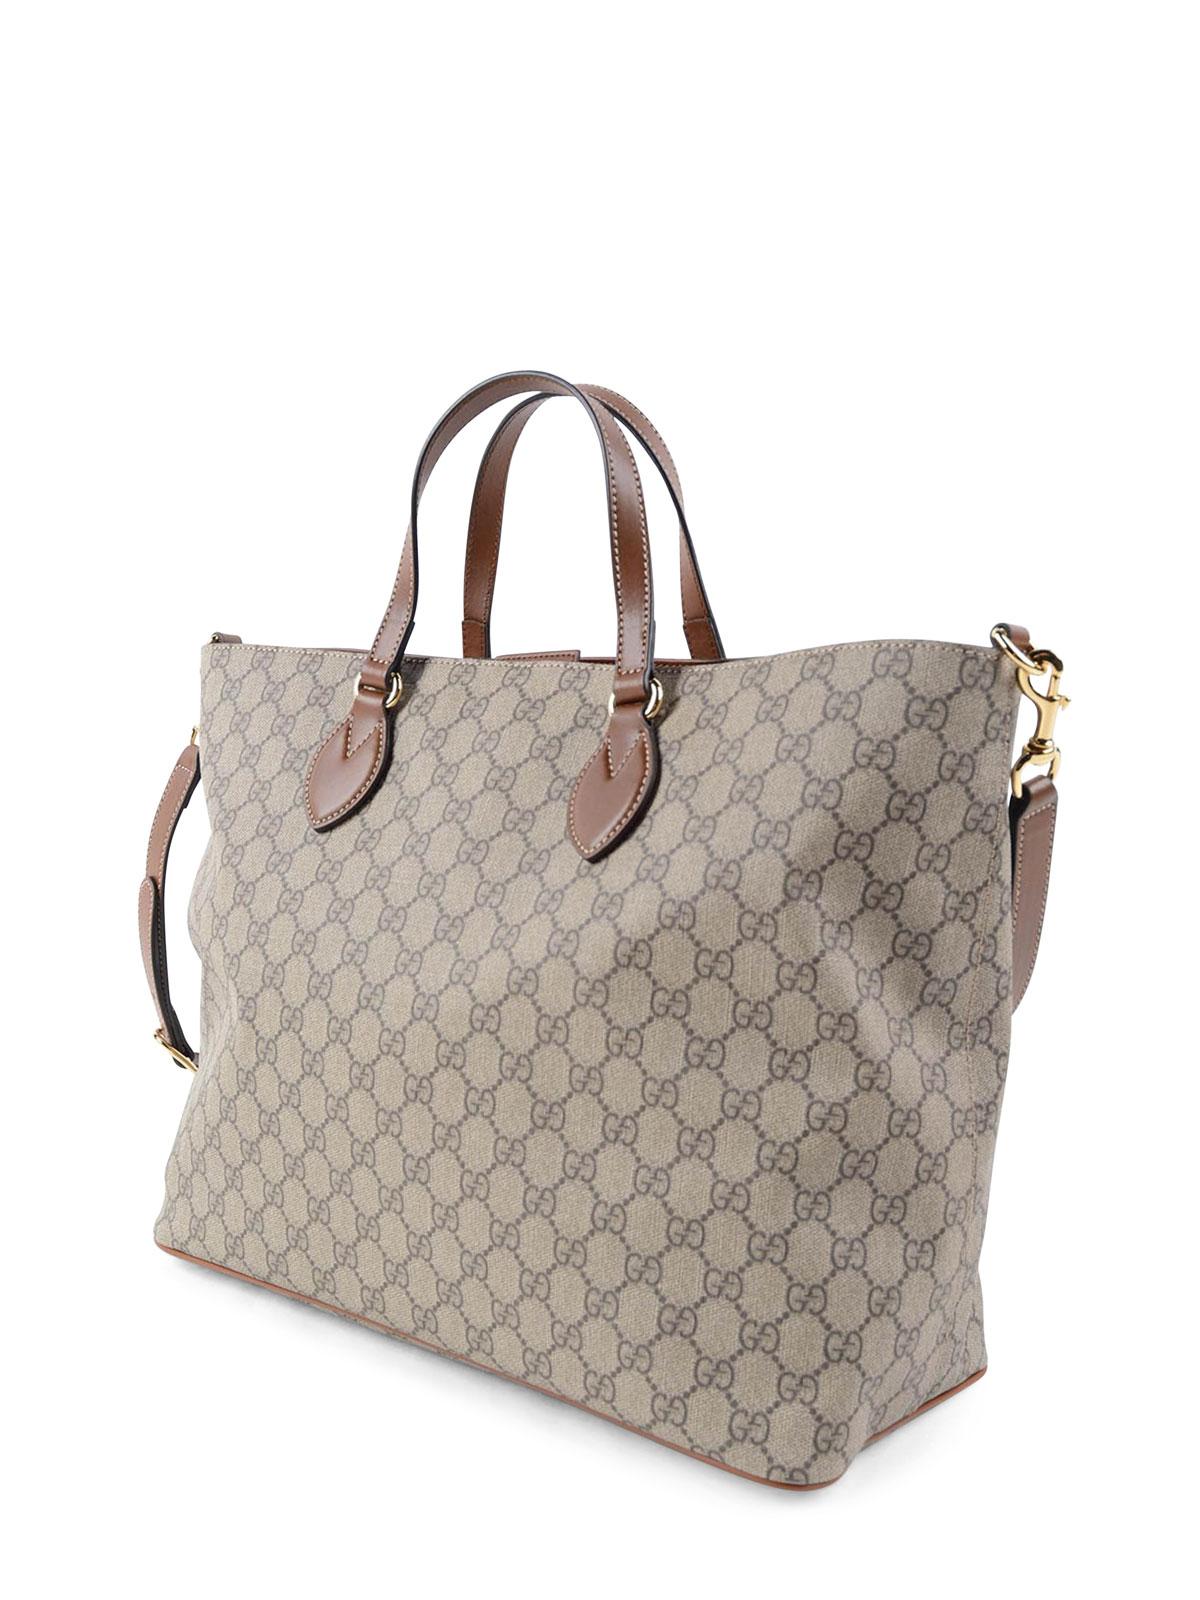 fabc032b2d95 Gucci - GG Supreme canvas tote bag - totes bags - 453705K5I2G 8526